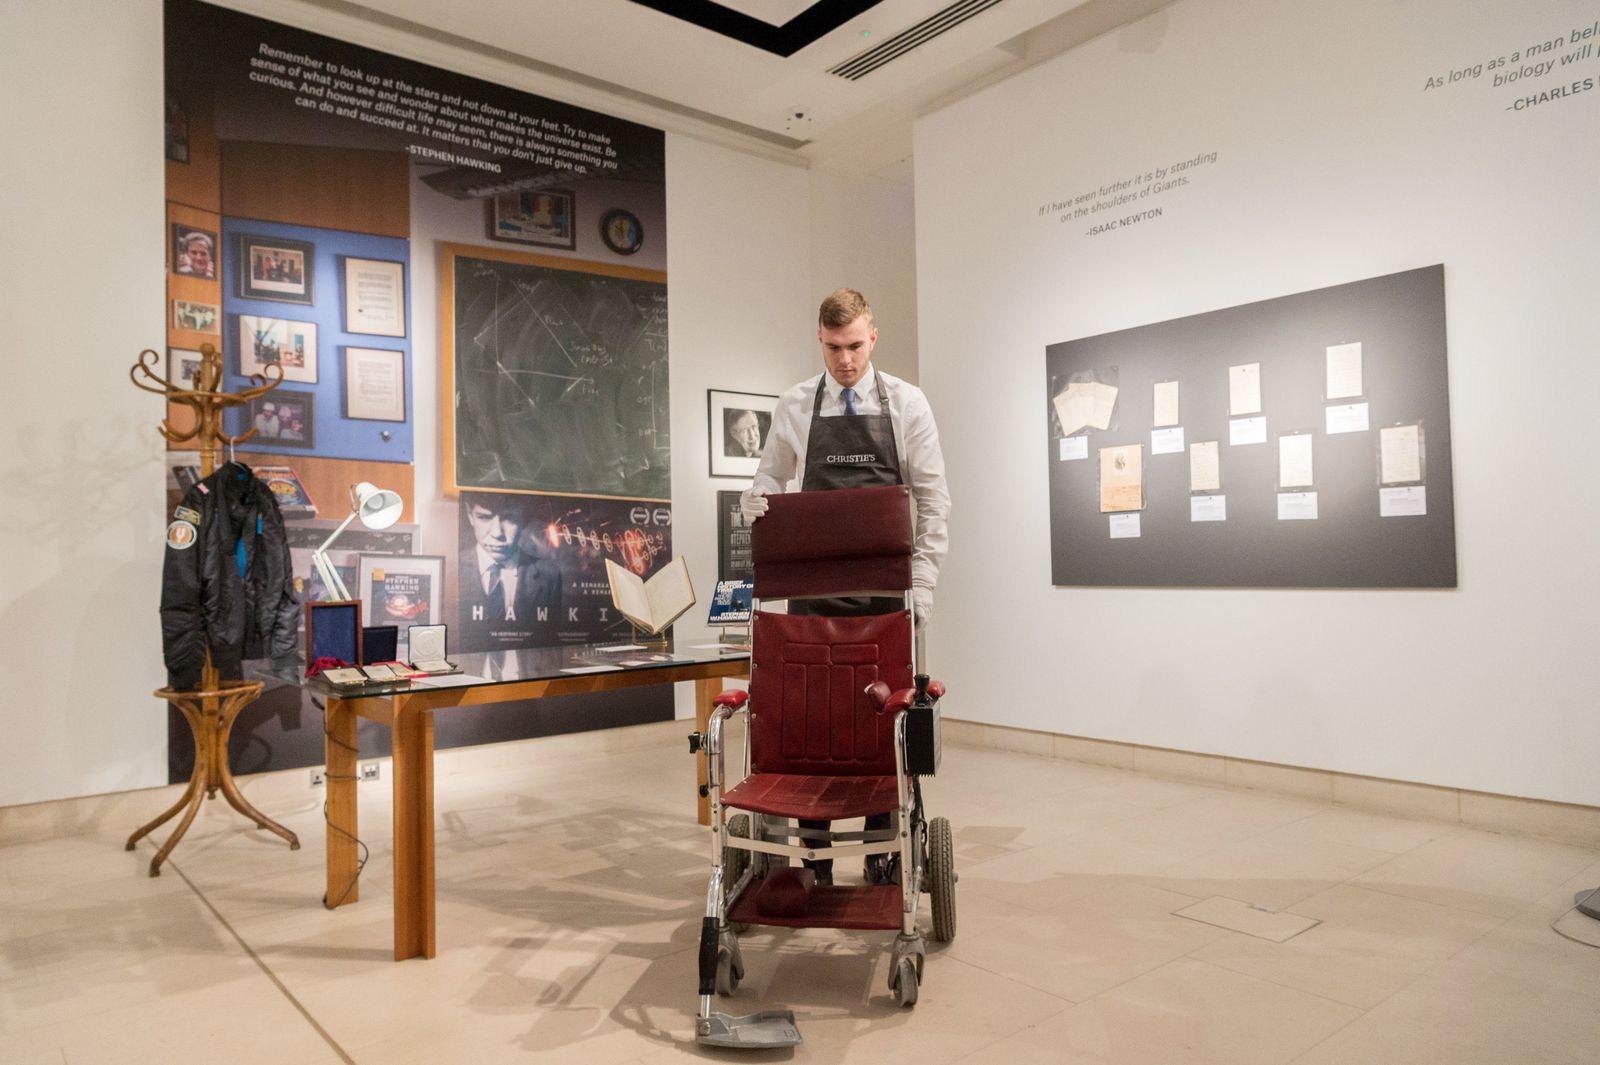 Stephen Hawkings Nachlass im Auktionshaus Christies